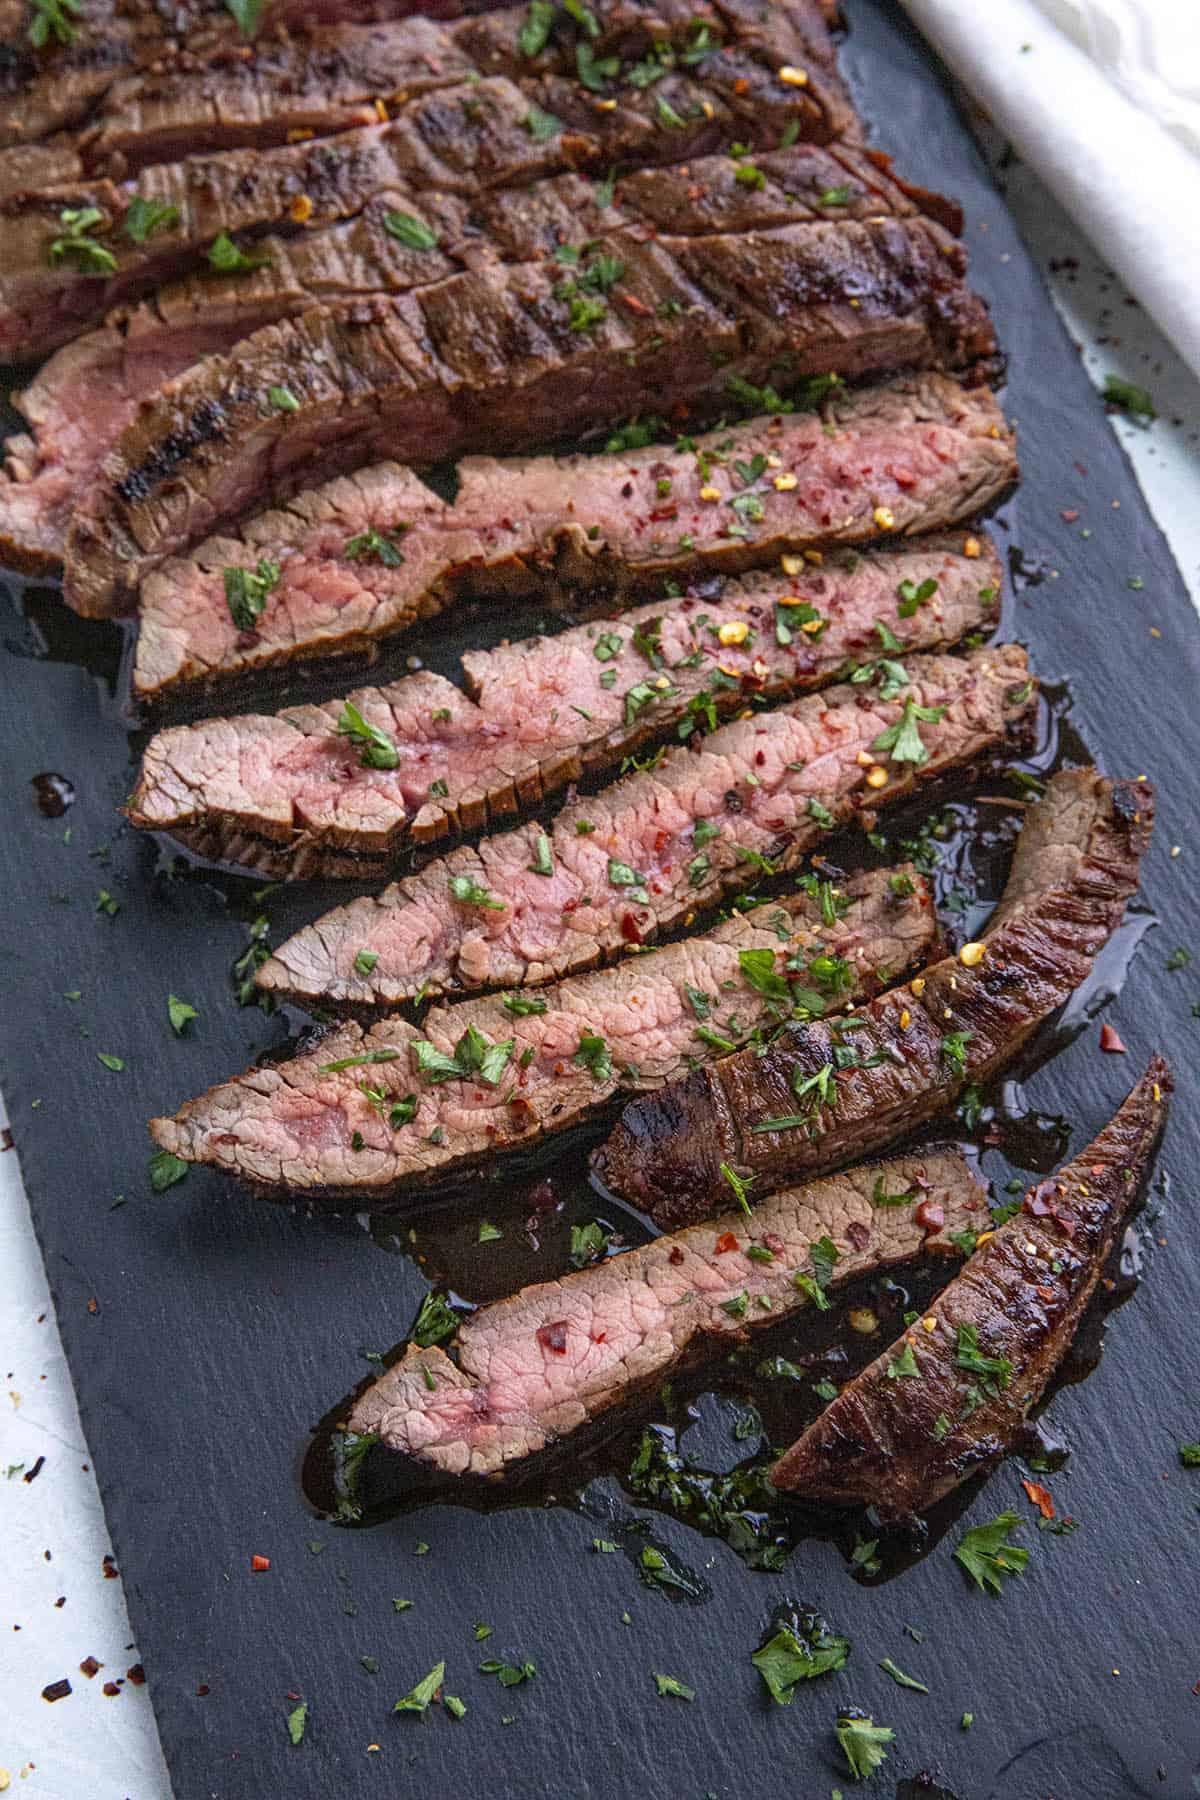 Sliced marinated flank steak on a cutting board